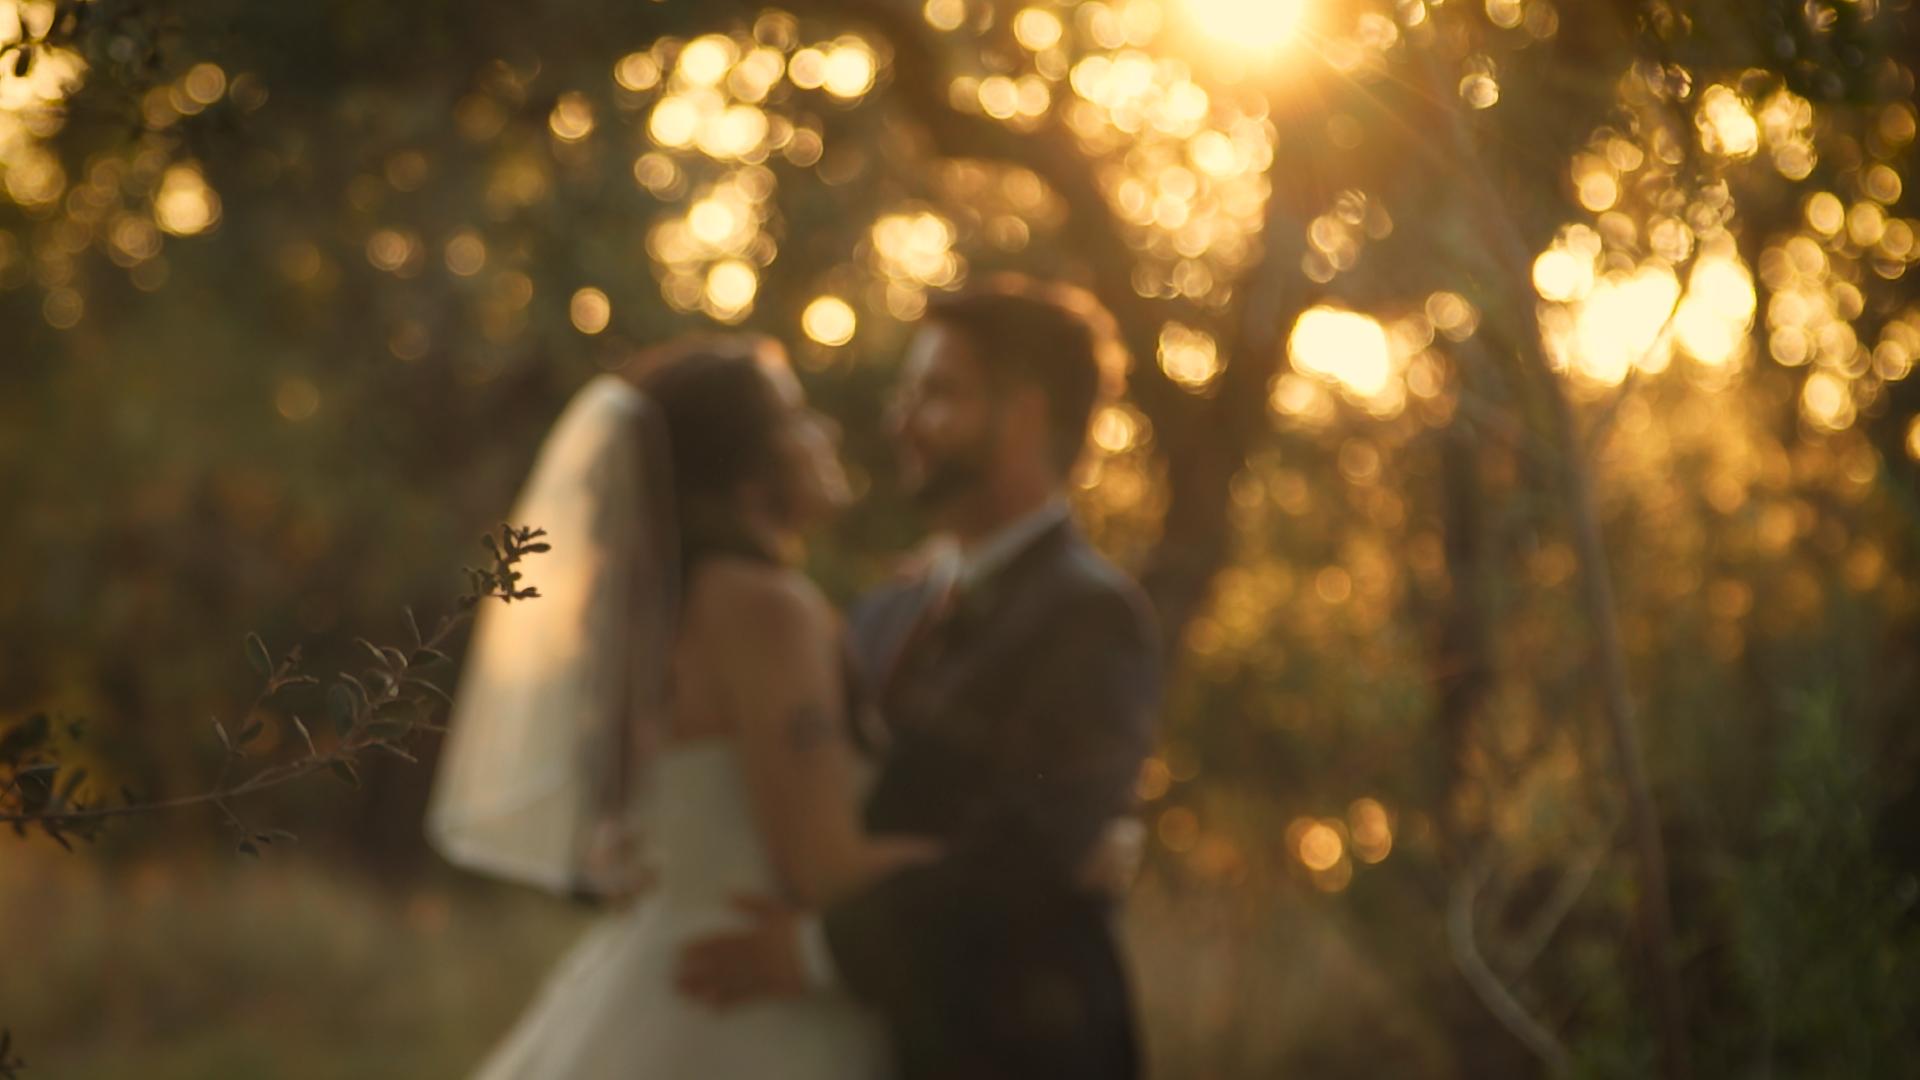 Rebecca_and_Daniel_Wedding_Austin_Texas_Vista_West_Ranch25.png